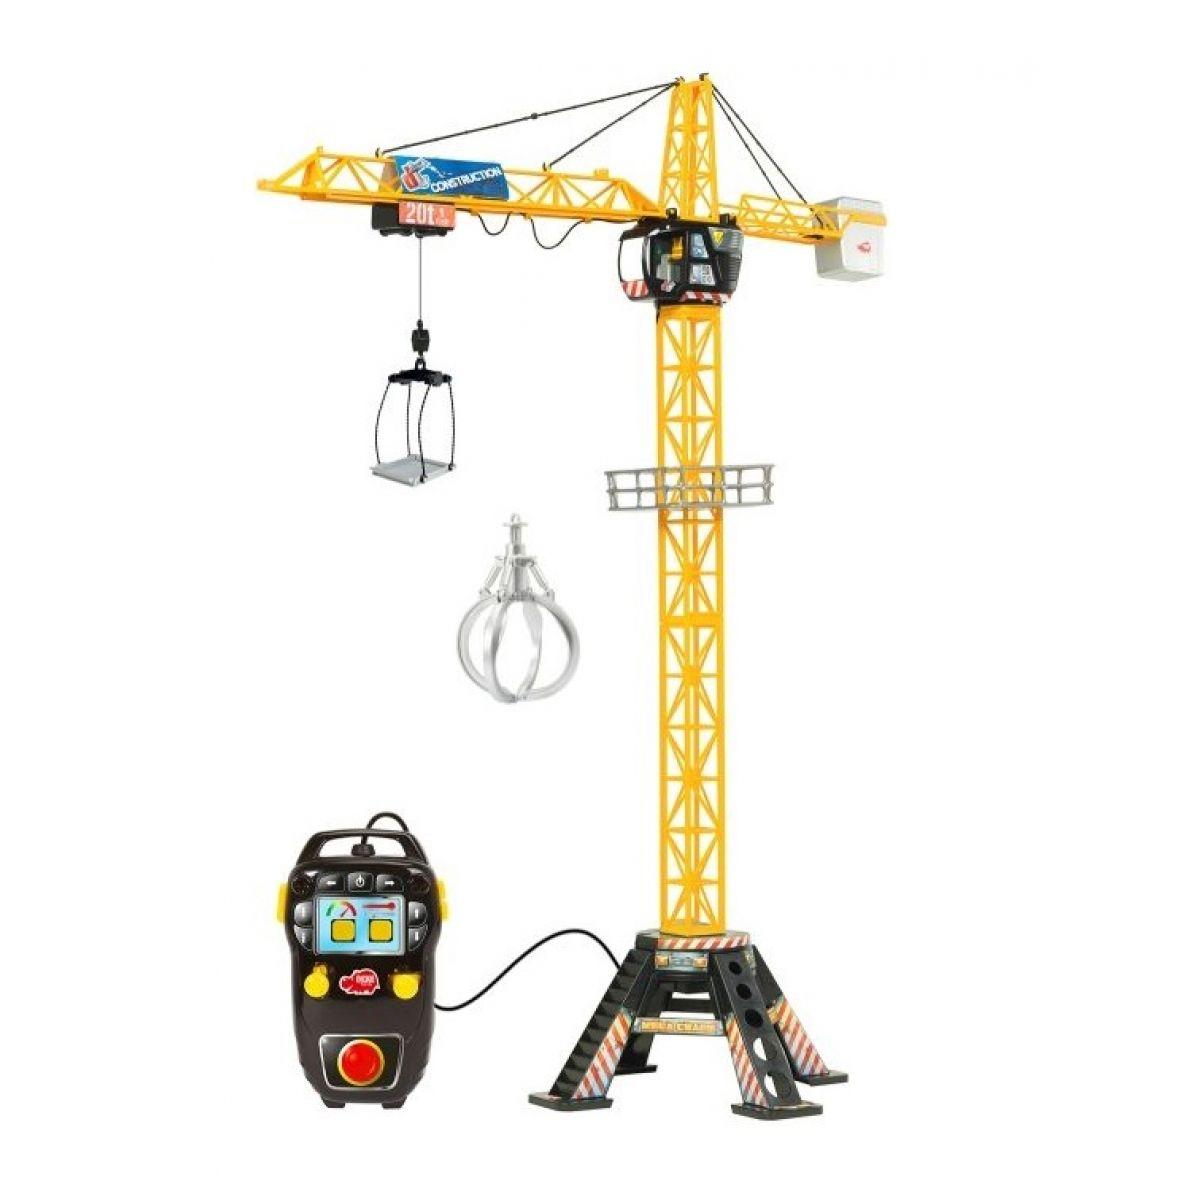 Dickie Jeřáb Mega Crane na kabel 120 cm - Poškozený obal